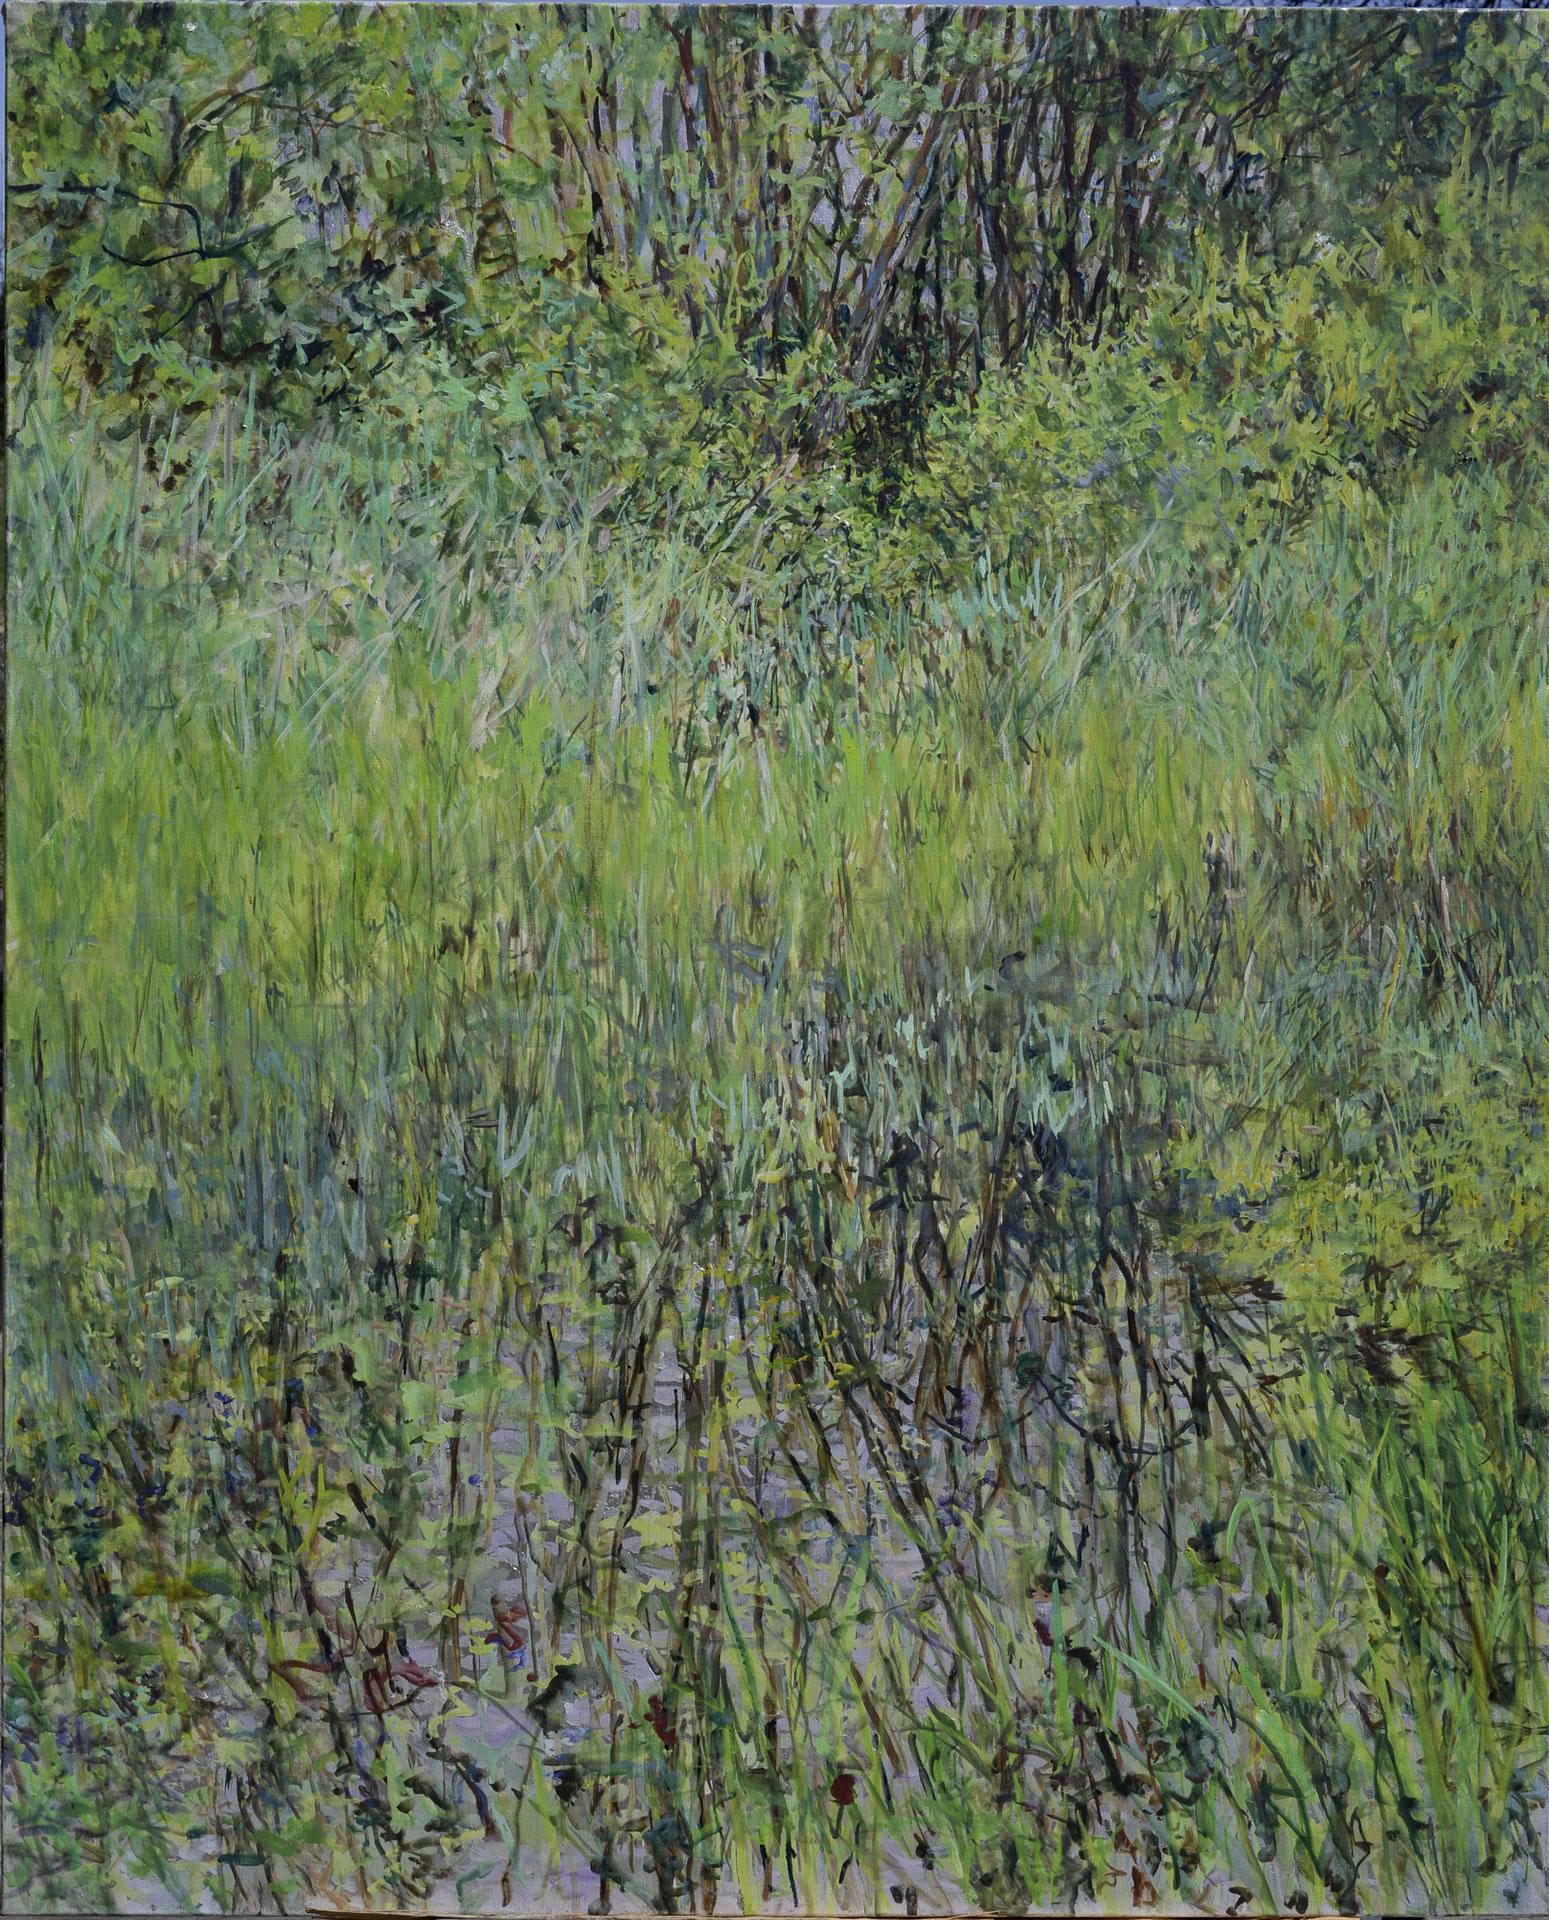 FLUX23 | Markus Orsini-Rosenberg | Teich Frühling 1 | 2015 | 137 x 110 cm